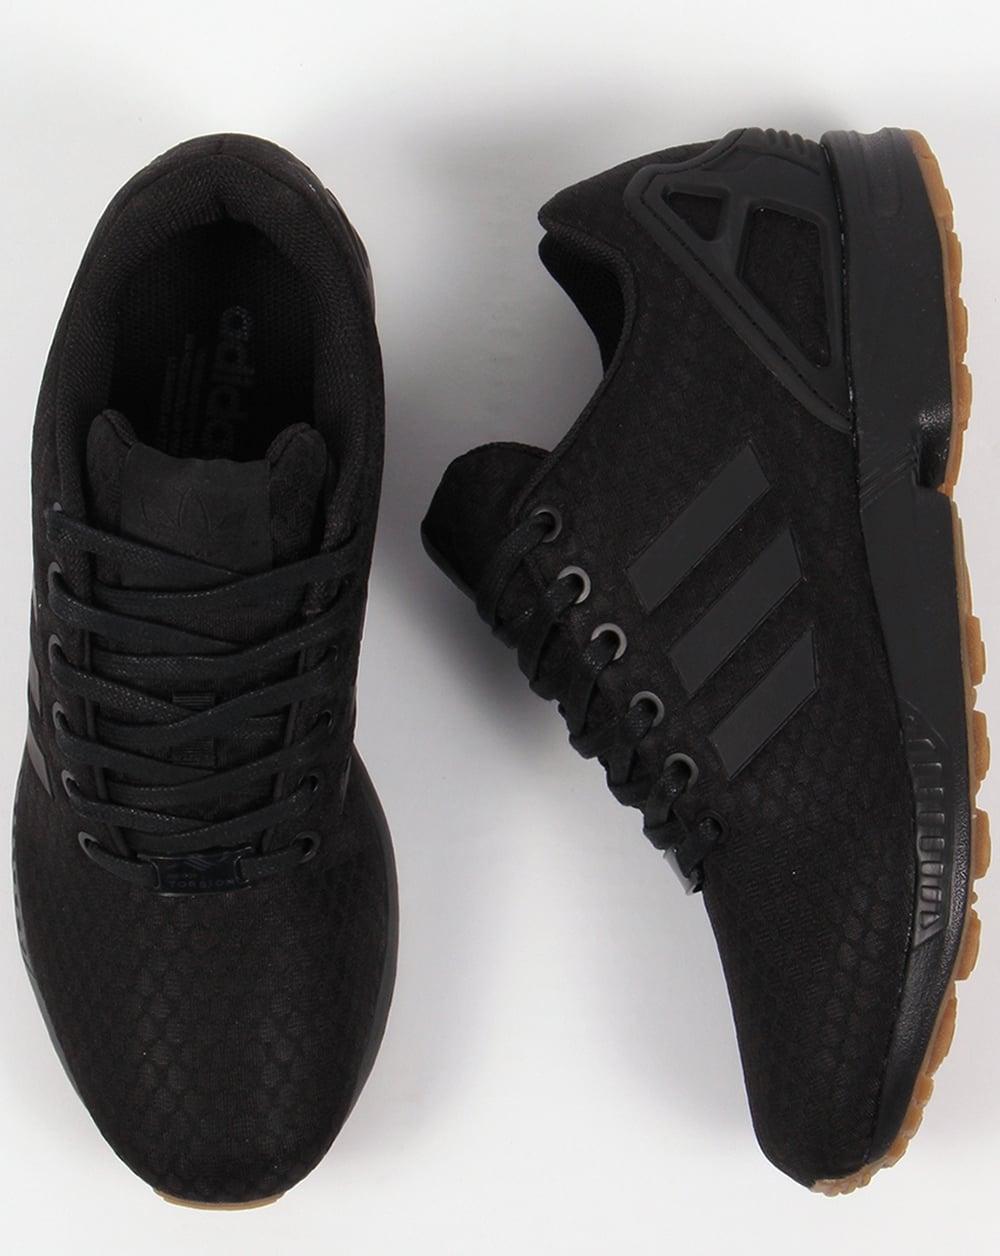 ad9a61bd91eca ... shop adidas zx flux trainers black black gum c5320 7a31c